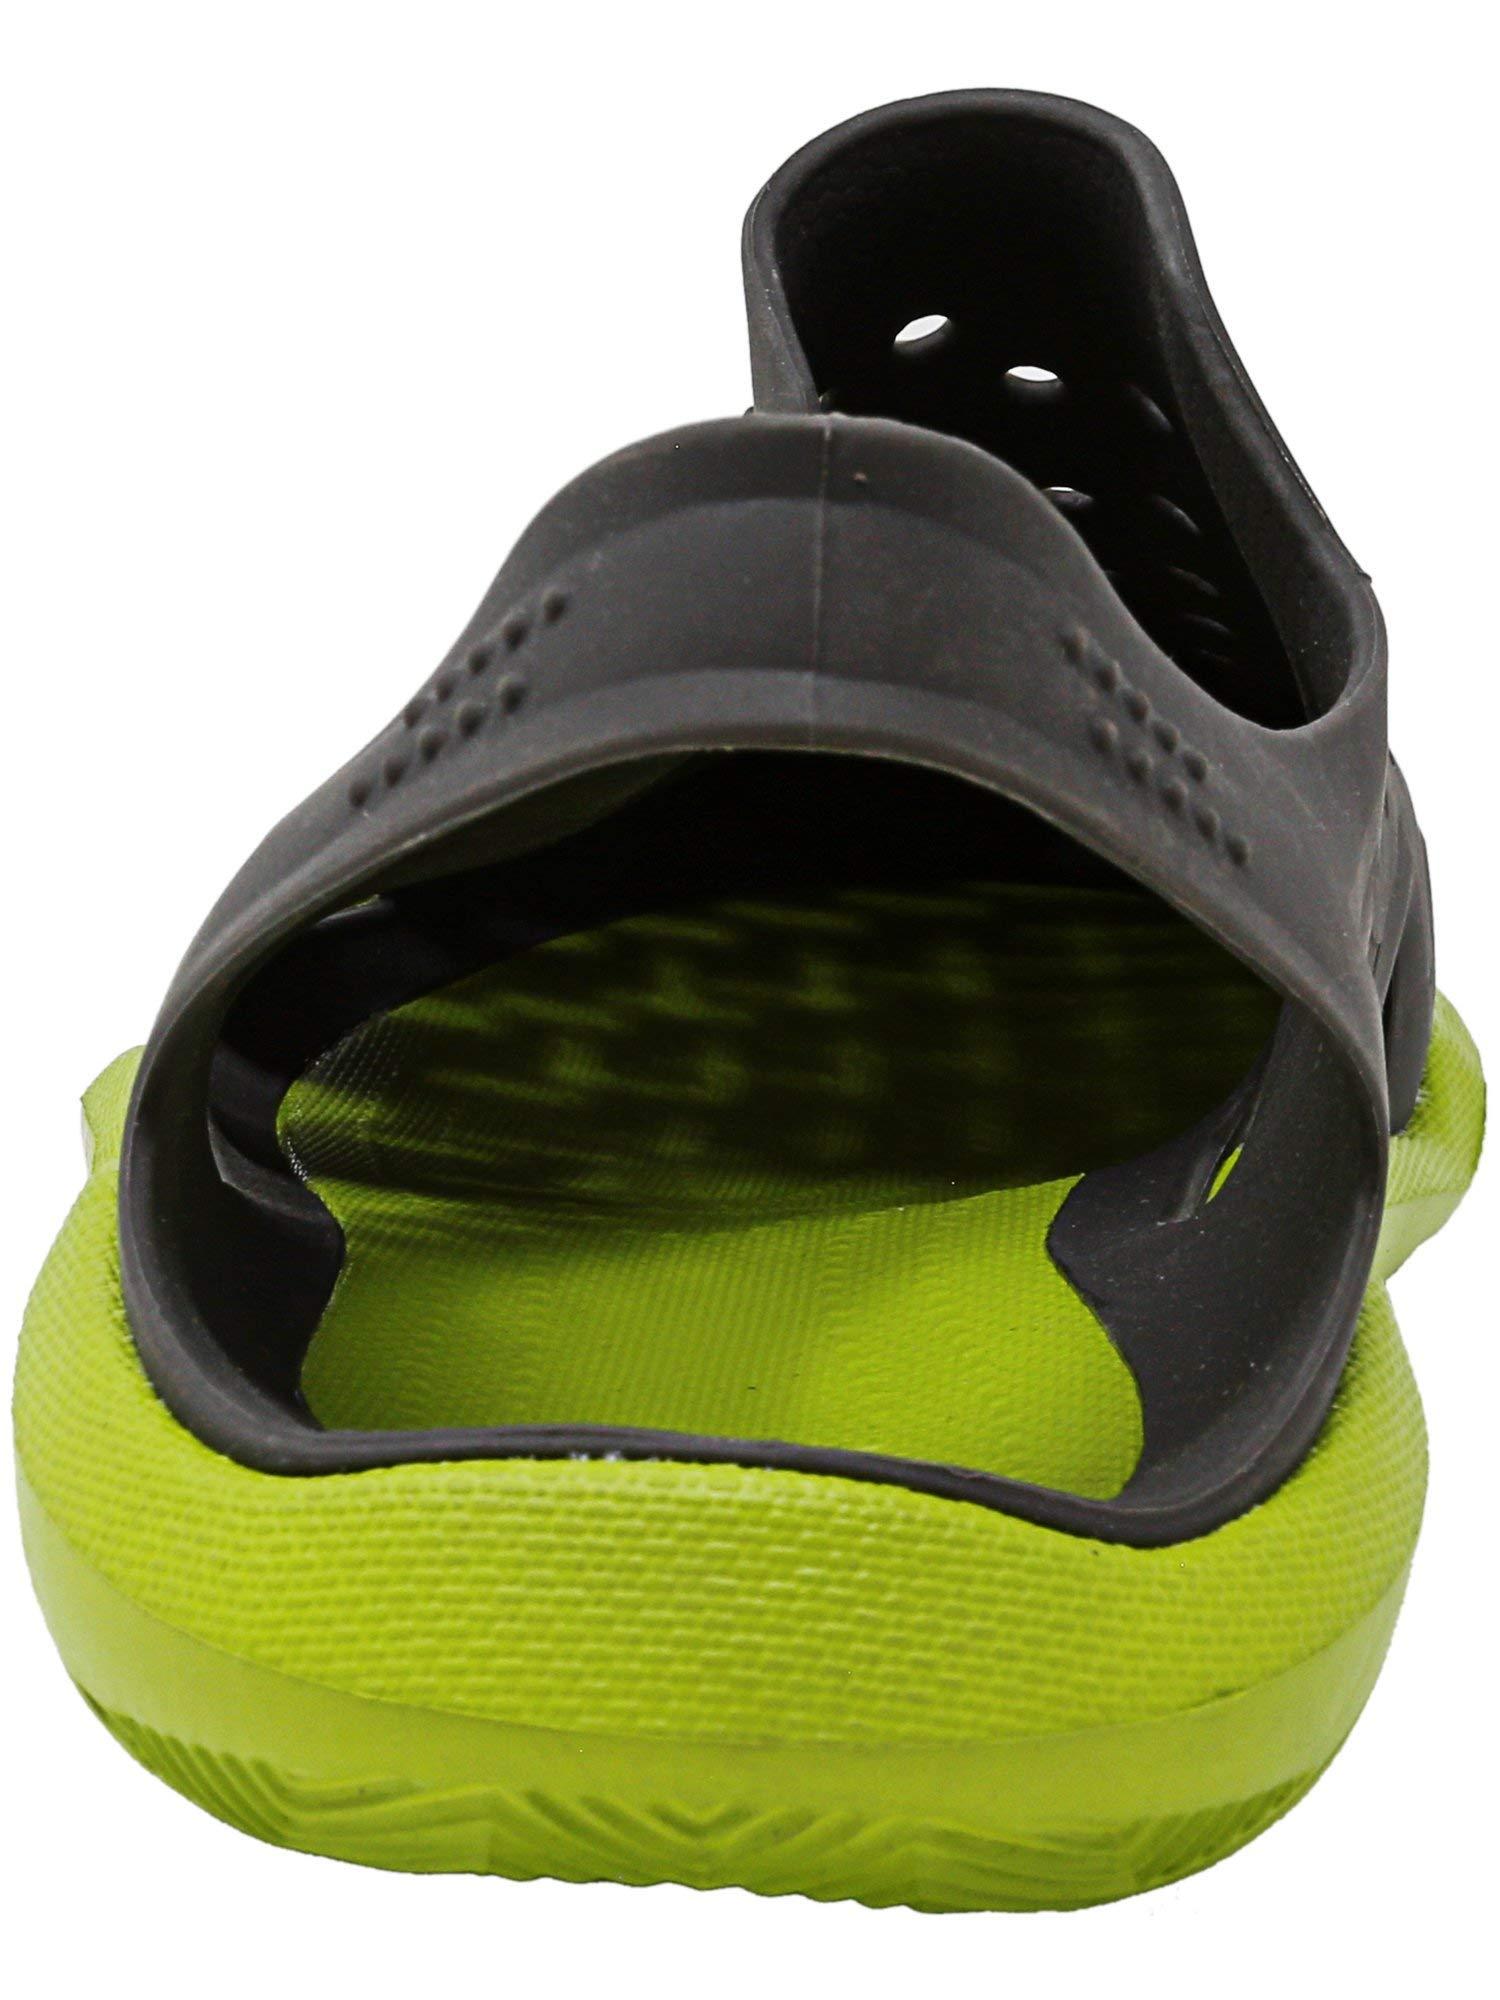 Crocs Men's Swiftwater Wave Graphite/Volt Green Ankle-High Rubber Sandal - 4M by Crocs (Image #3)